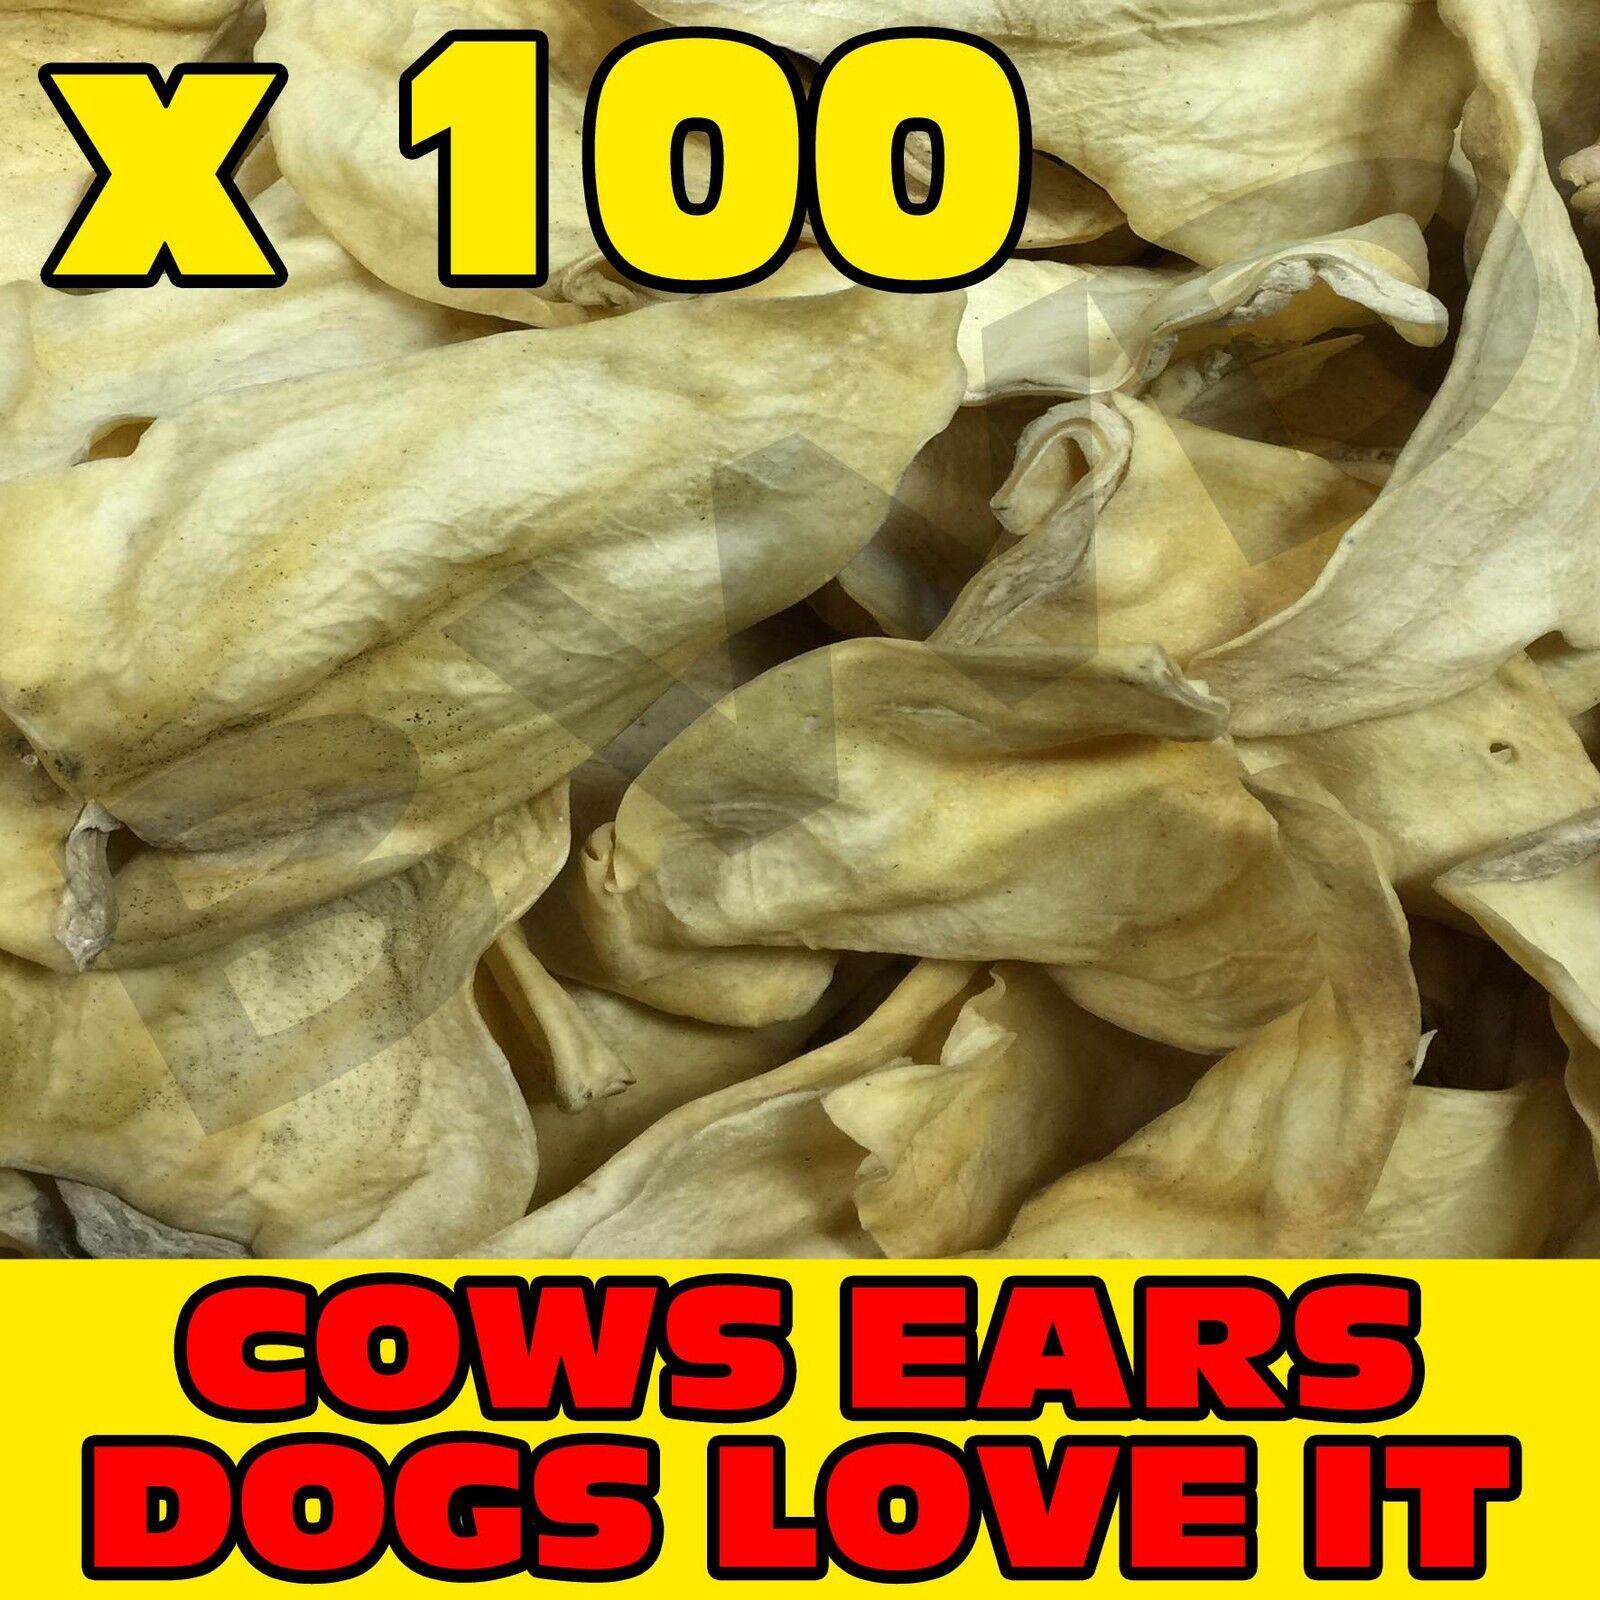 100 x TASTY COW COWS BEEF EAR EARS DOG PET TREAT CHEW SNACK - VALUE